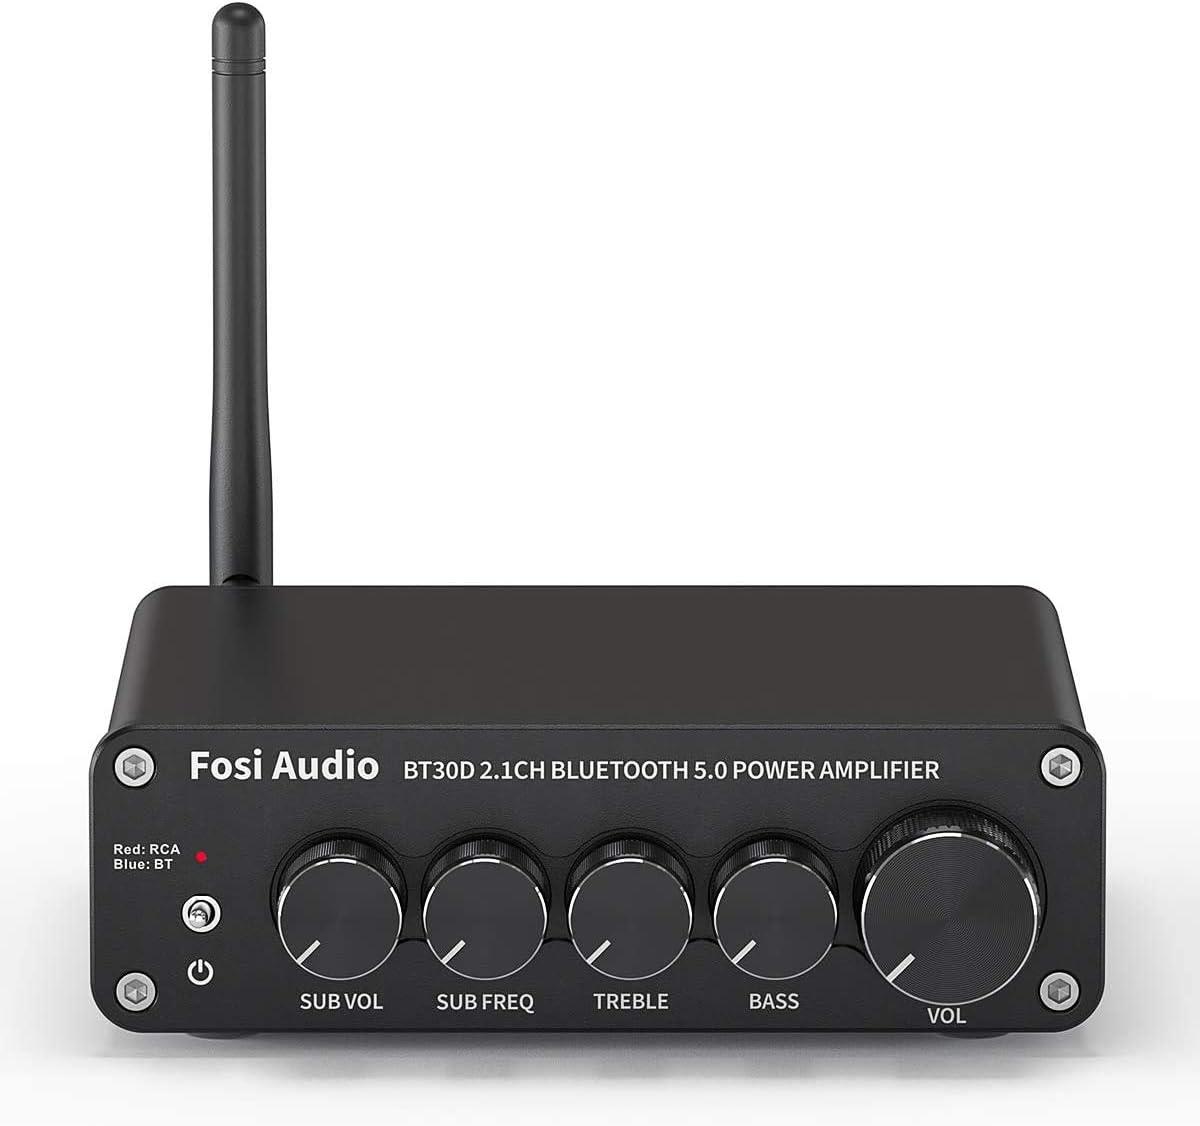 Fosi Audio BT30D Bluetooth 5.0 Amplifier Stereo Audio 2.1 Channel Receiver Amplifier 50 Watt x2+100 Watt Mini Hi-Fi Class D Integrated Amp for Home Outdoor Passive Speakers/Subwoofer Powered Subwoofer